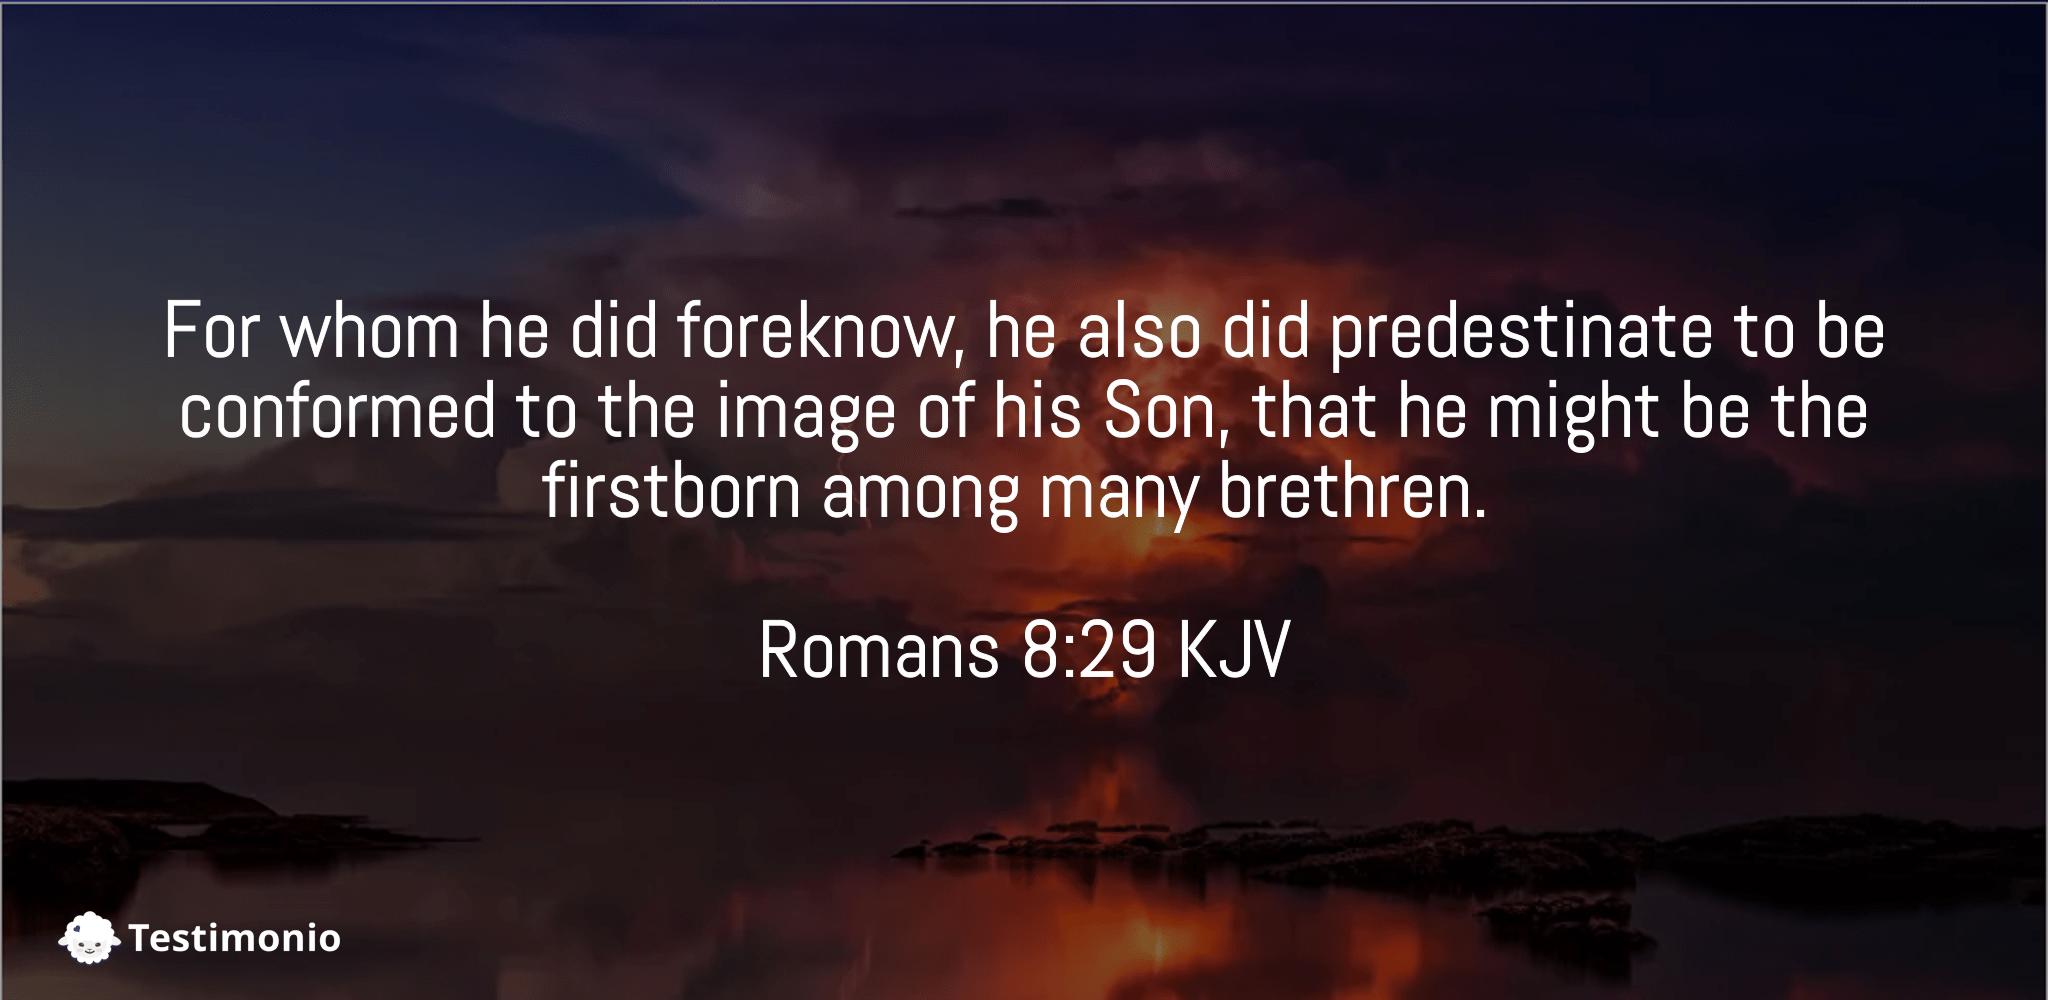 Romans 8:29